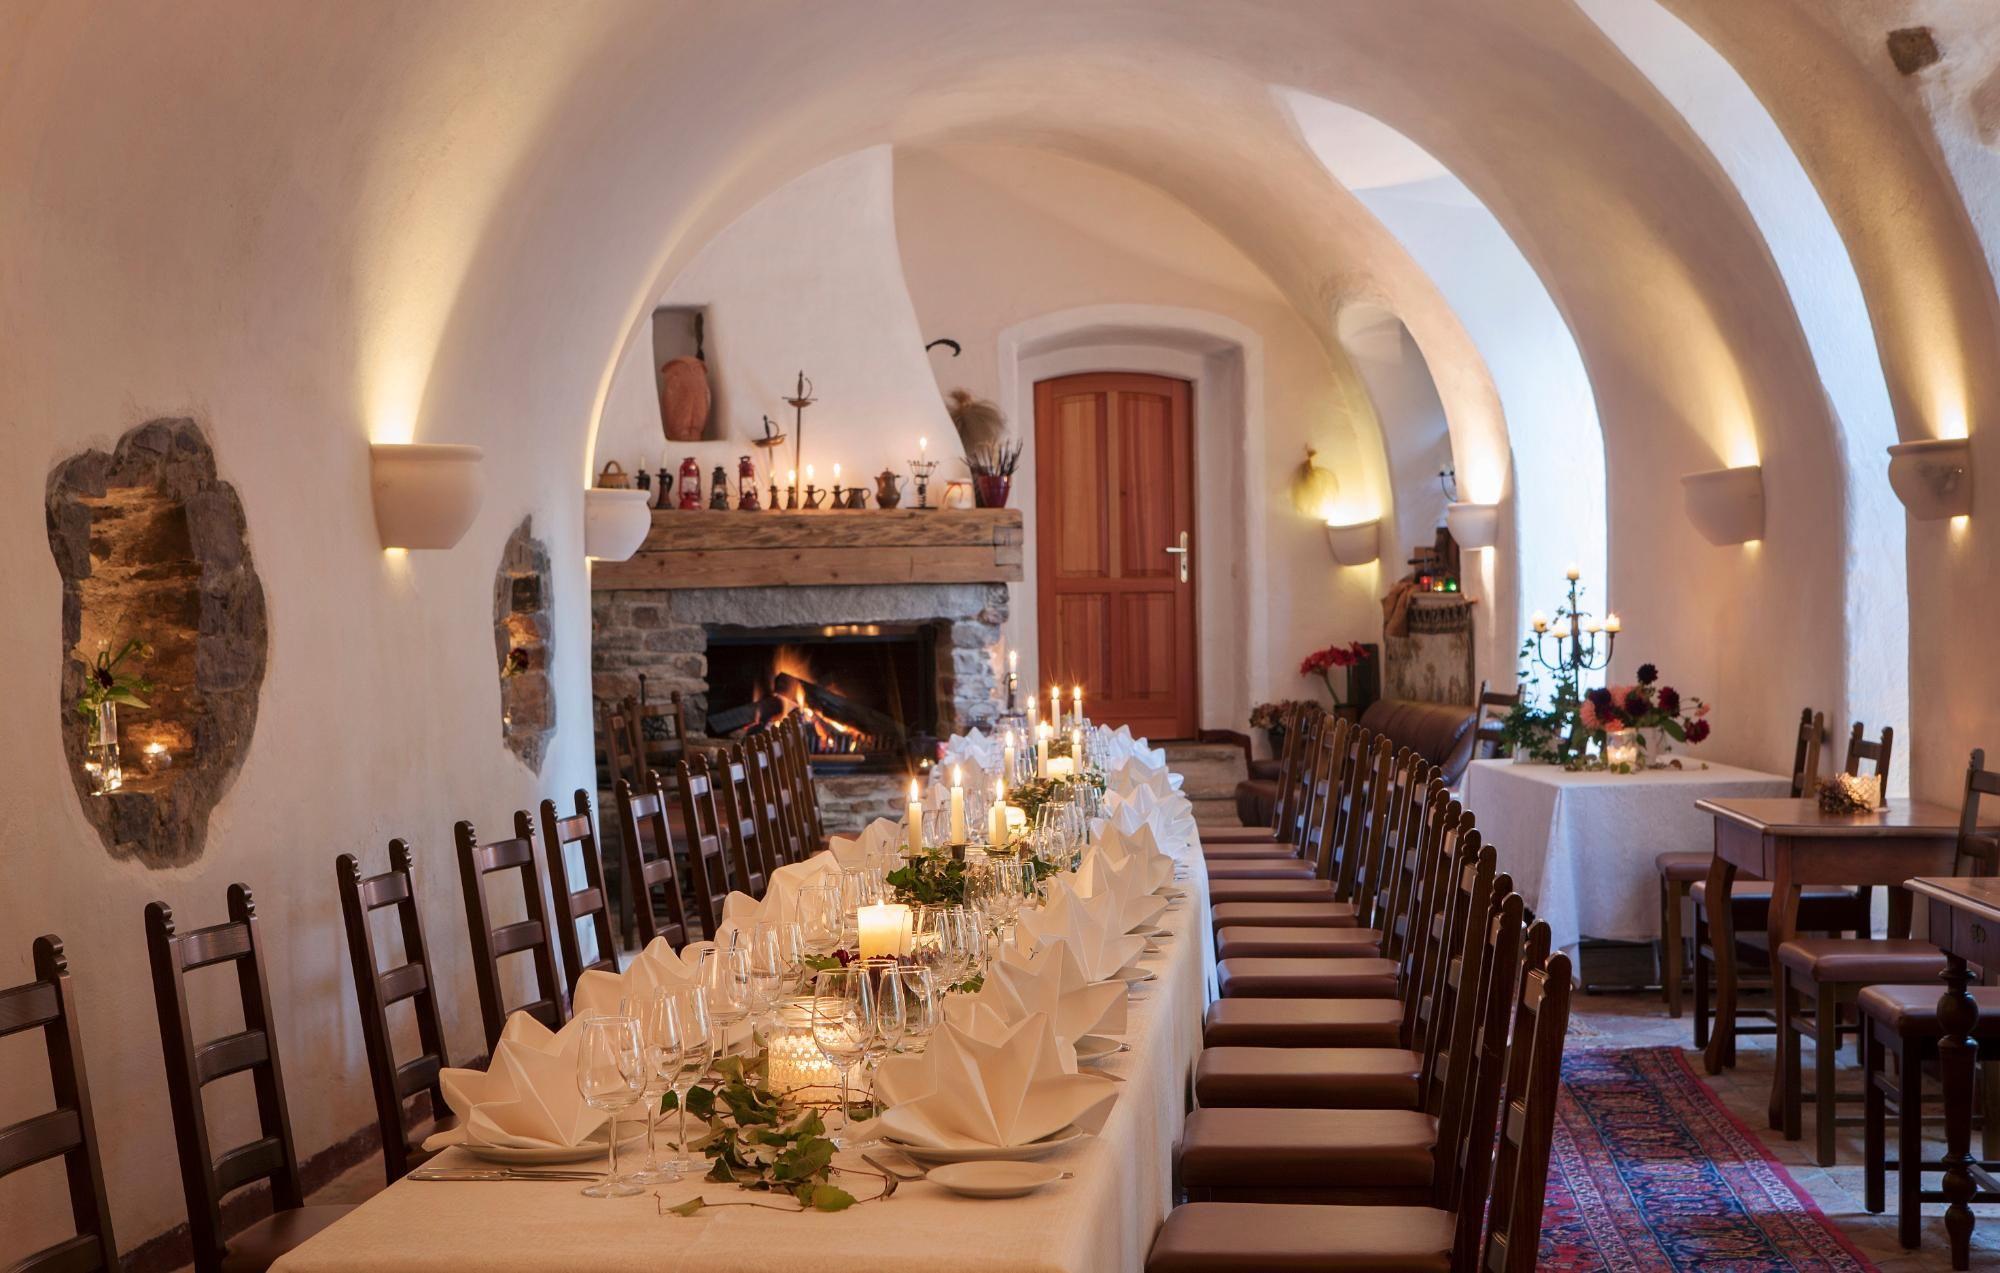 Magical Evening At Nikolaihof Wachau Review Of Nikolaihof Wachau Mautern An Wachau Lower Austria